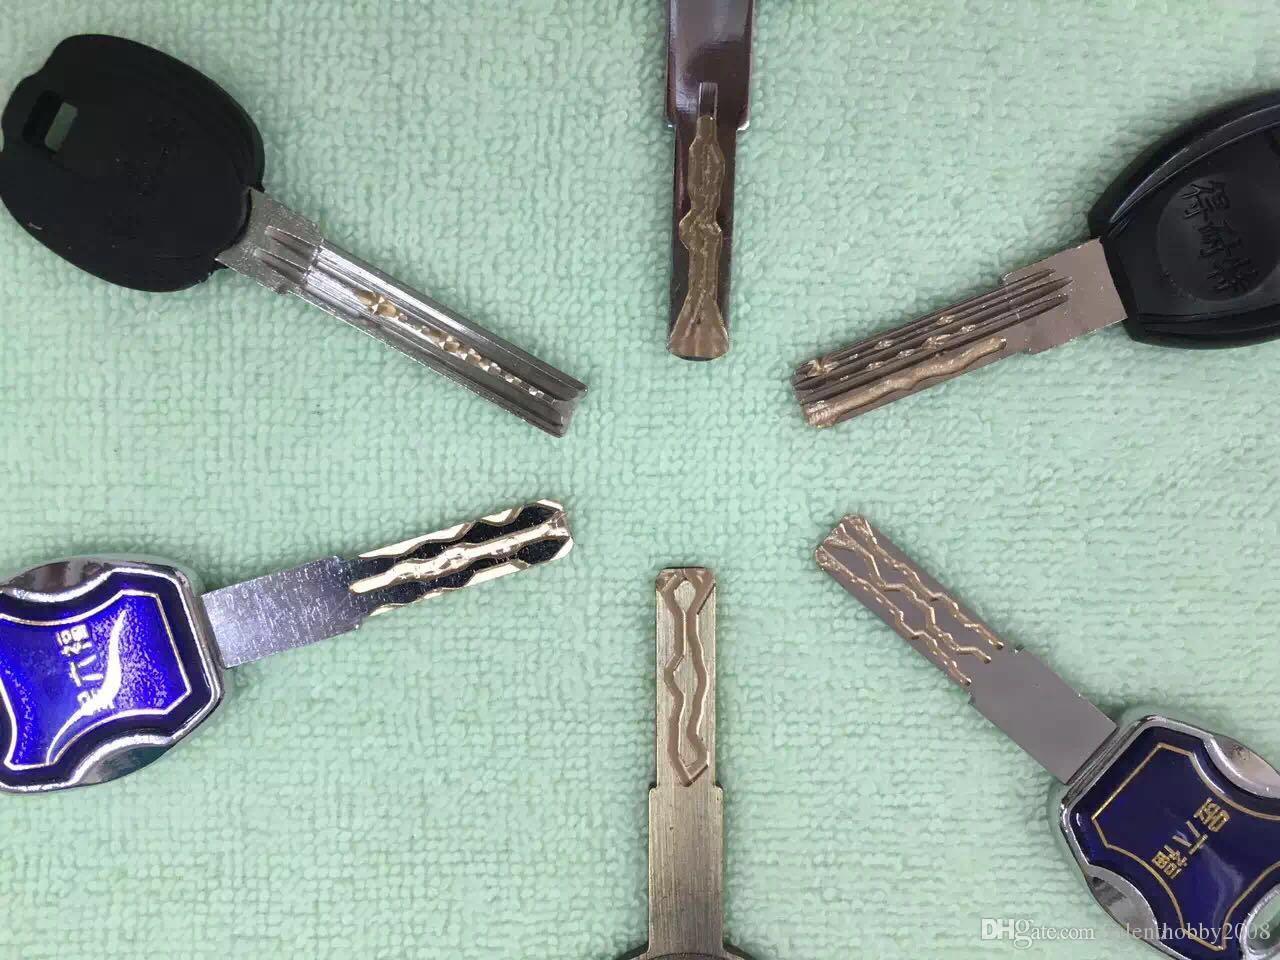 Newest super padlock Crescent-Shaped Double Side Lockpick Practice Padlock Crescent Lockpick Practice Padlock Training Tool for Locksmith